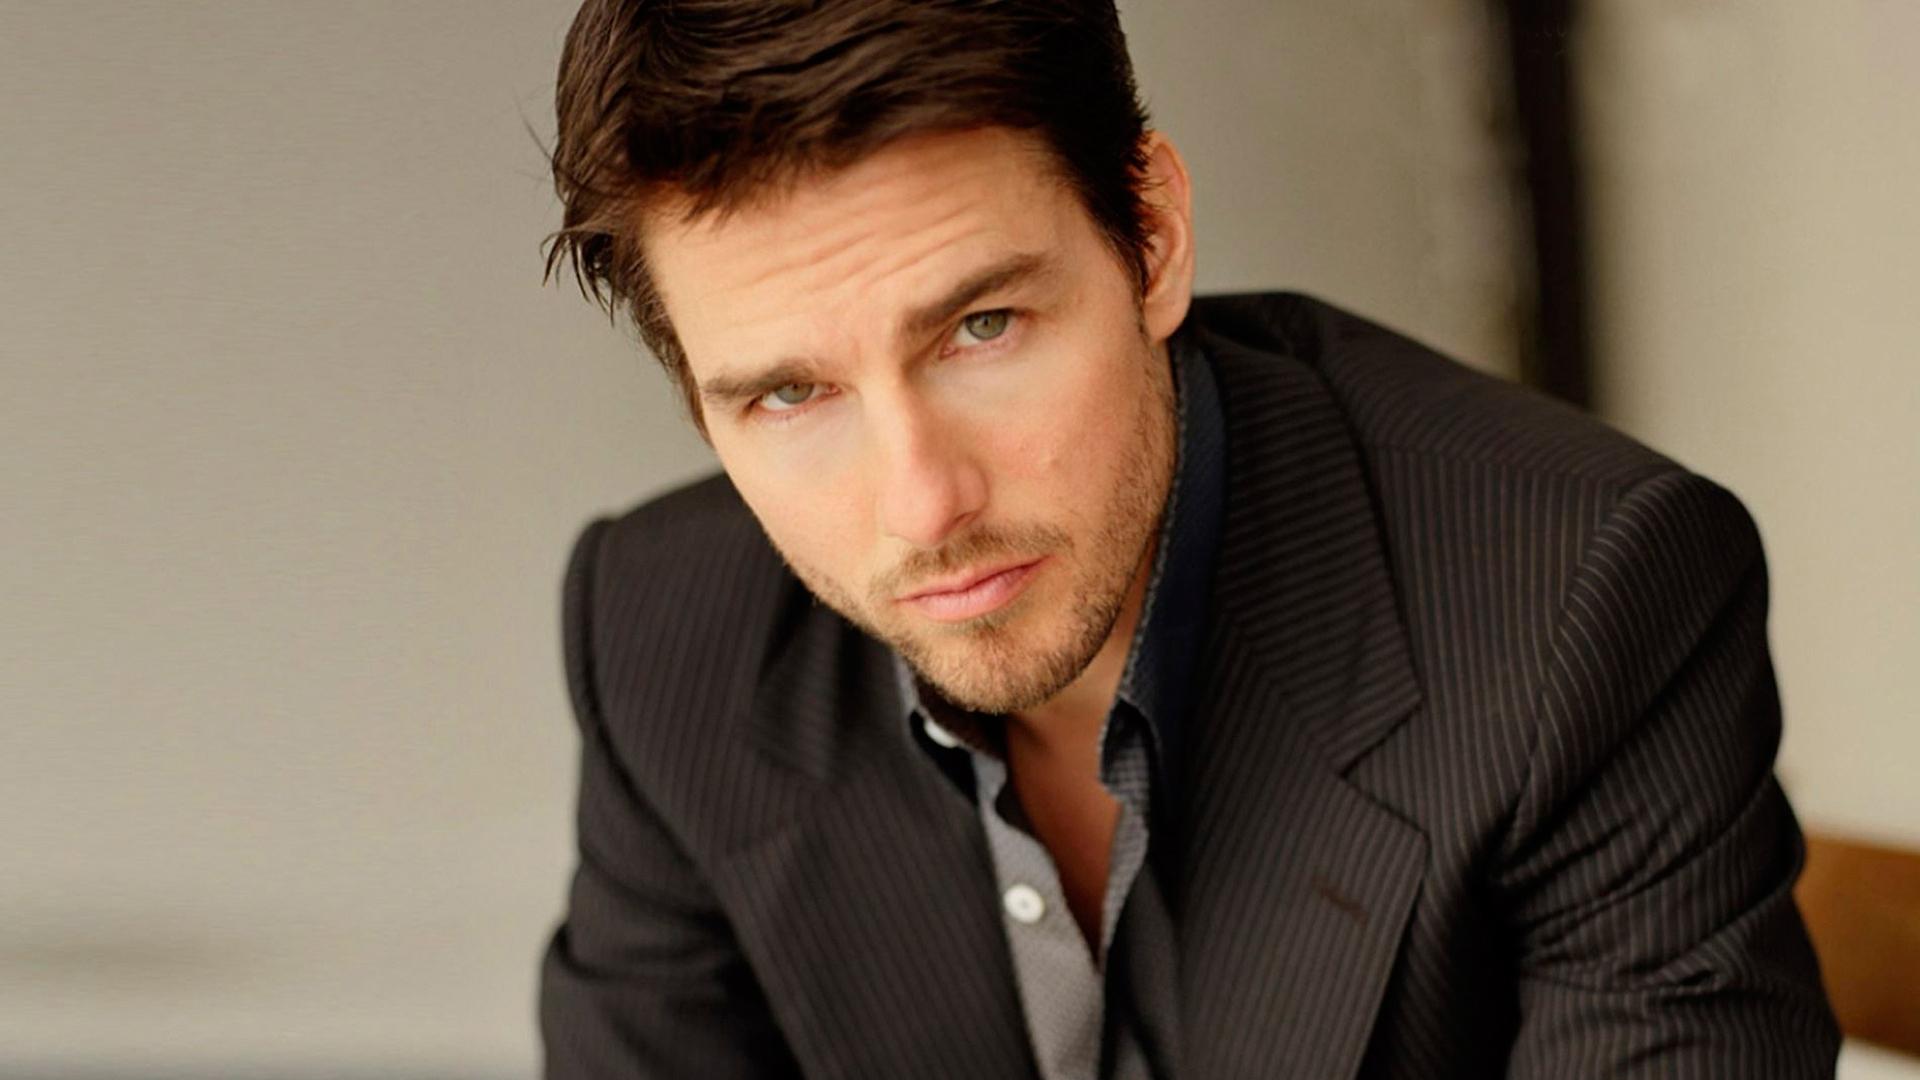 Tom Cruise Wallpaper 8